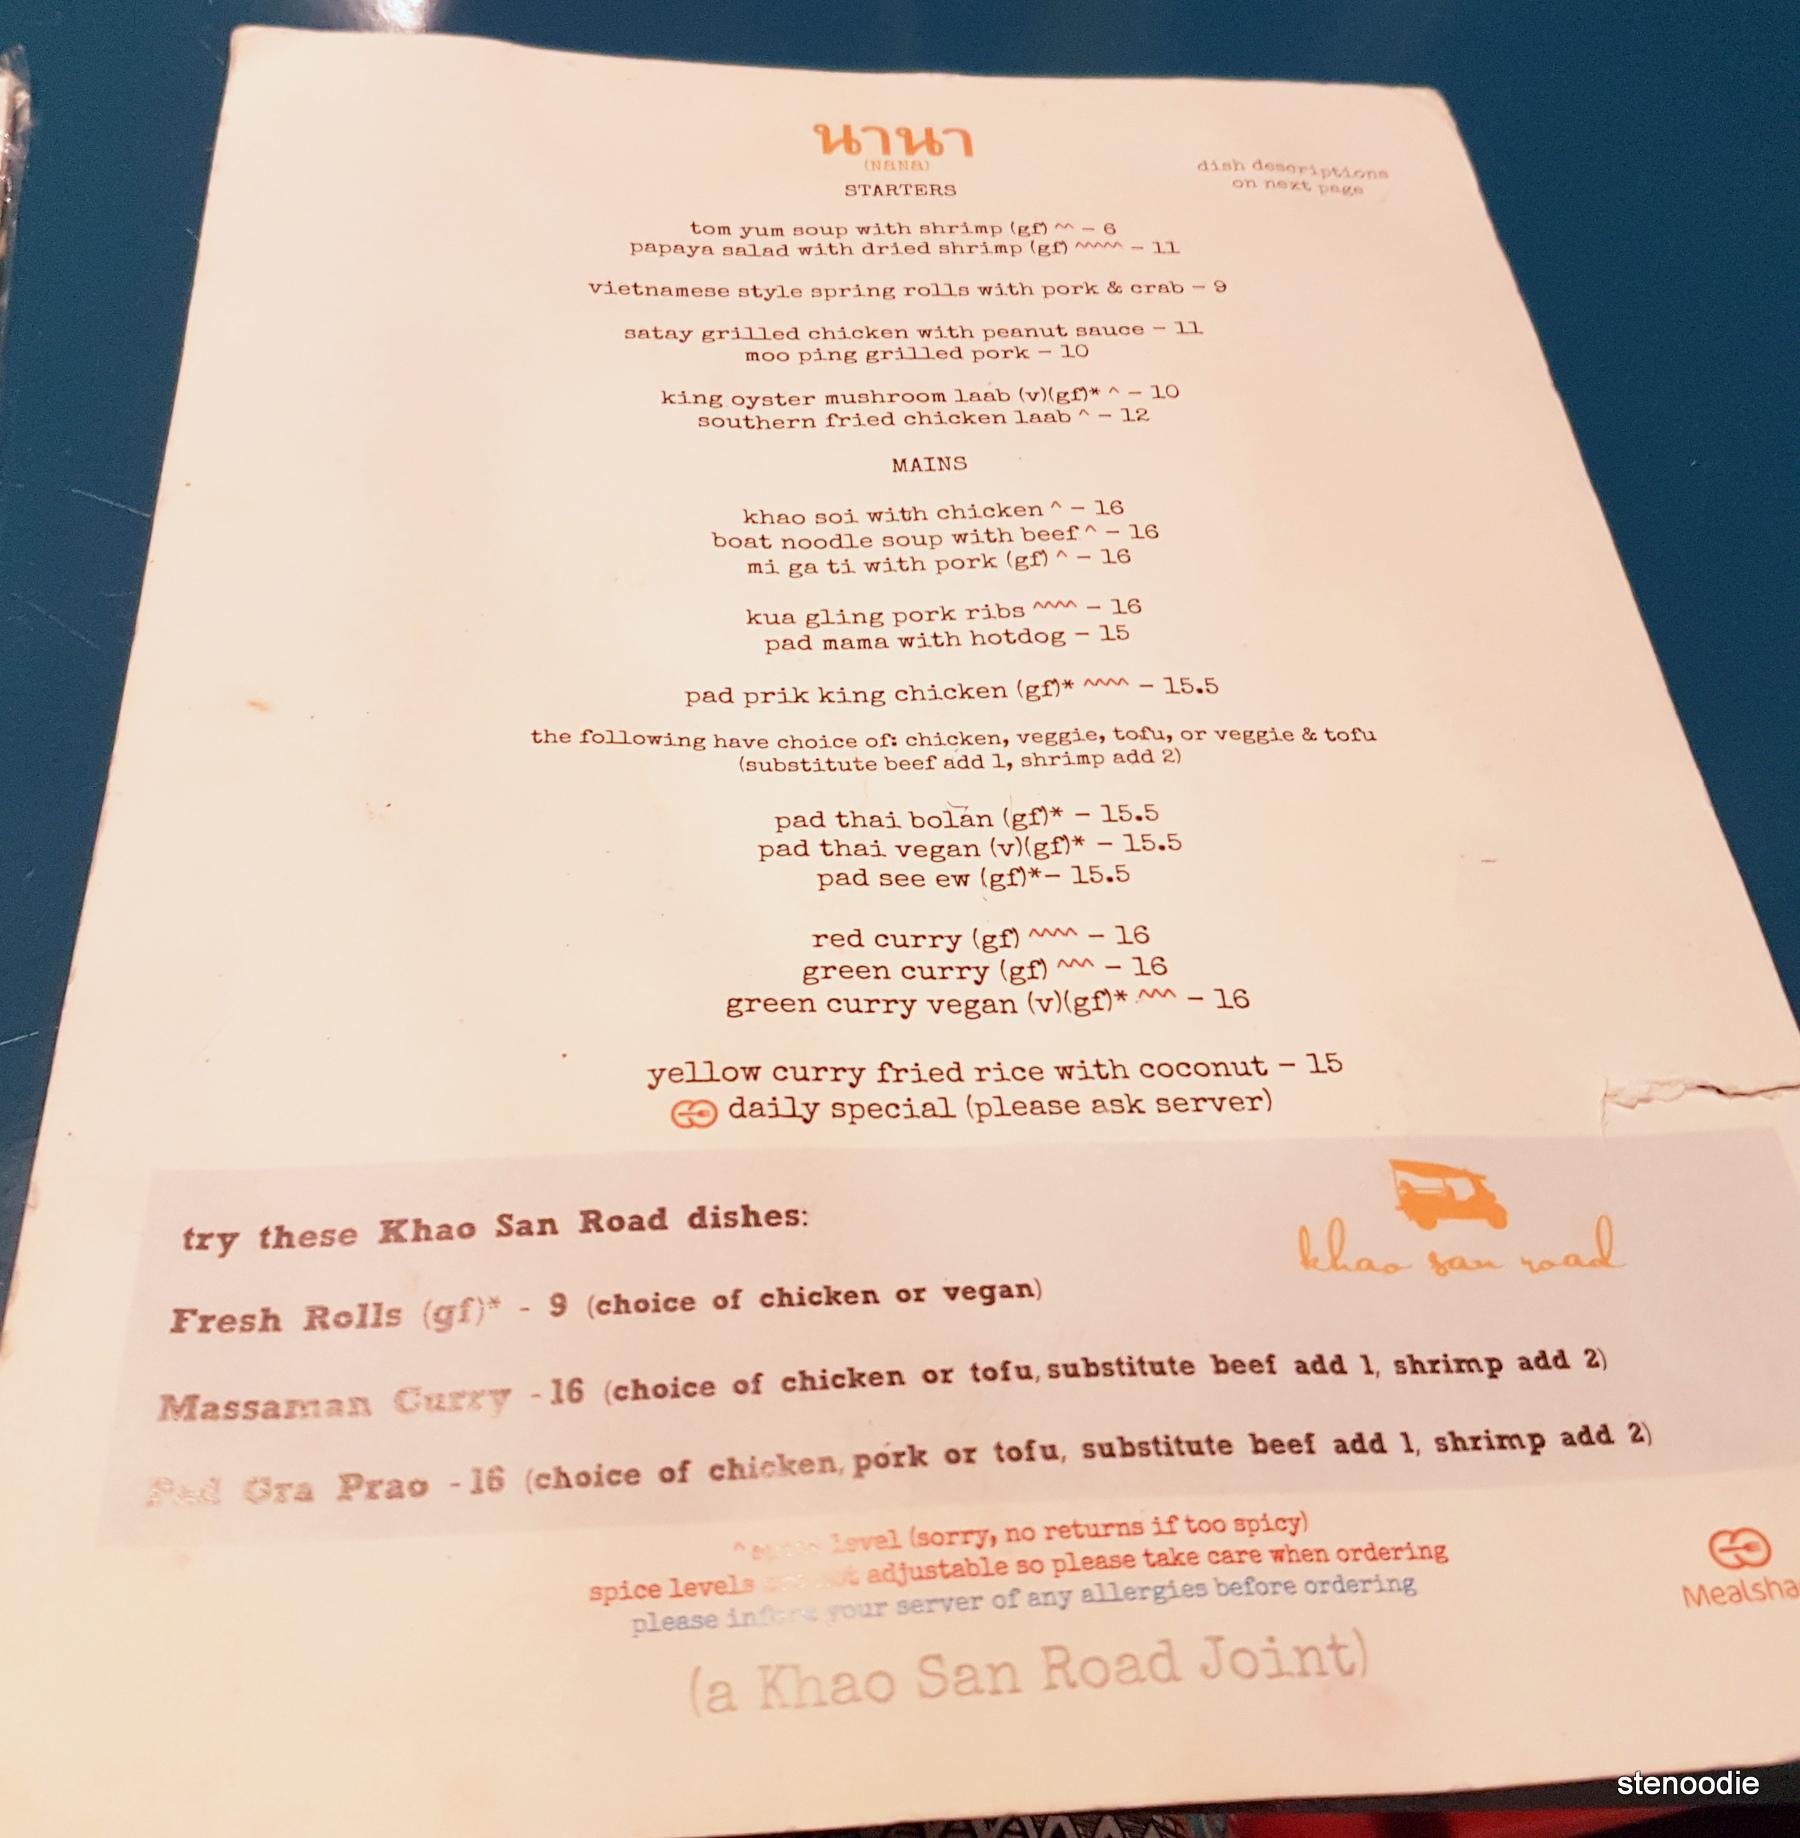 Nana Restaurant menu and prices